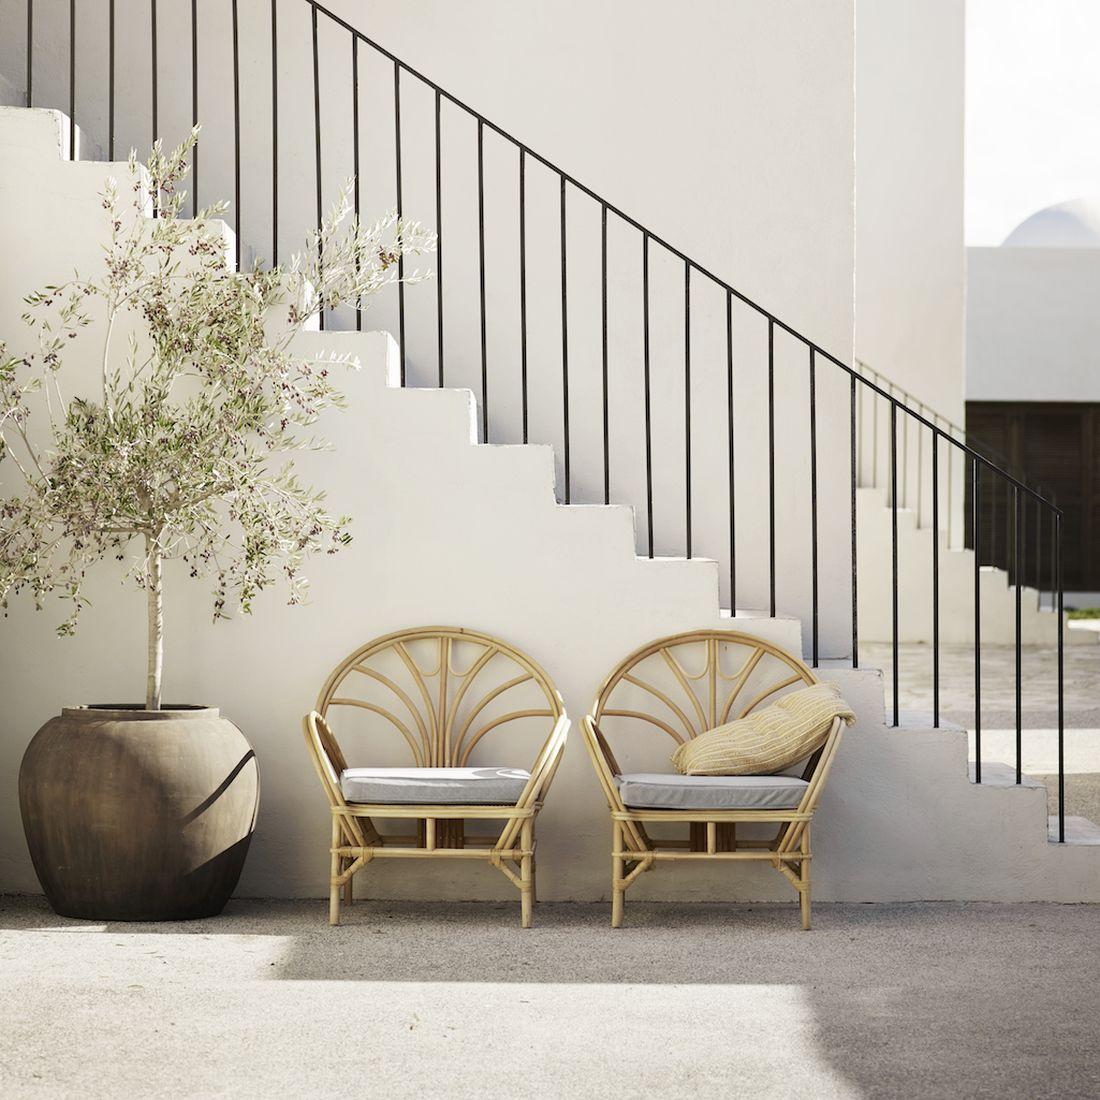 9idyll-home_tine-k-rattan-chair.jpg